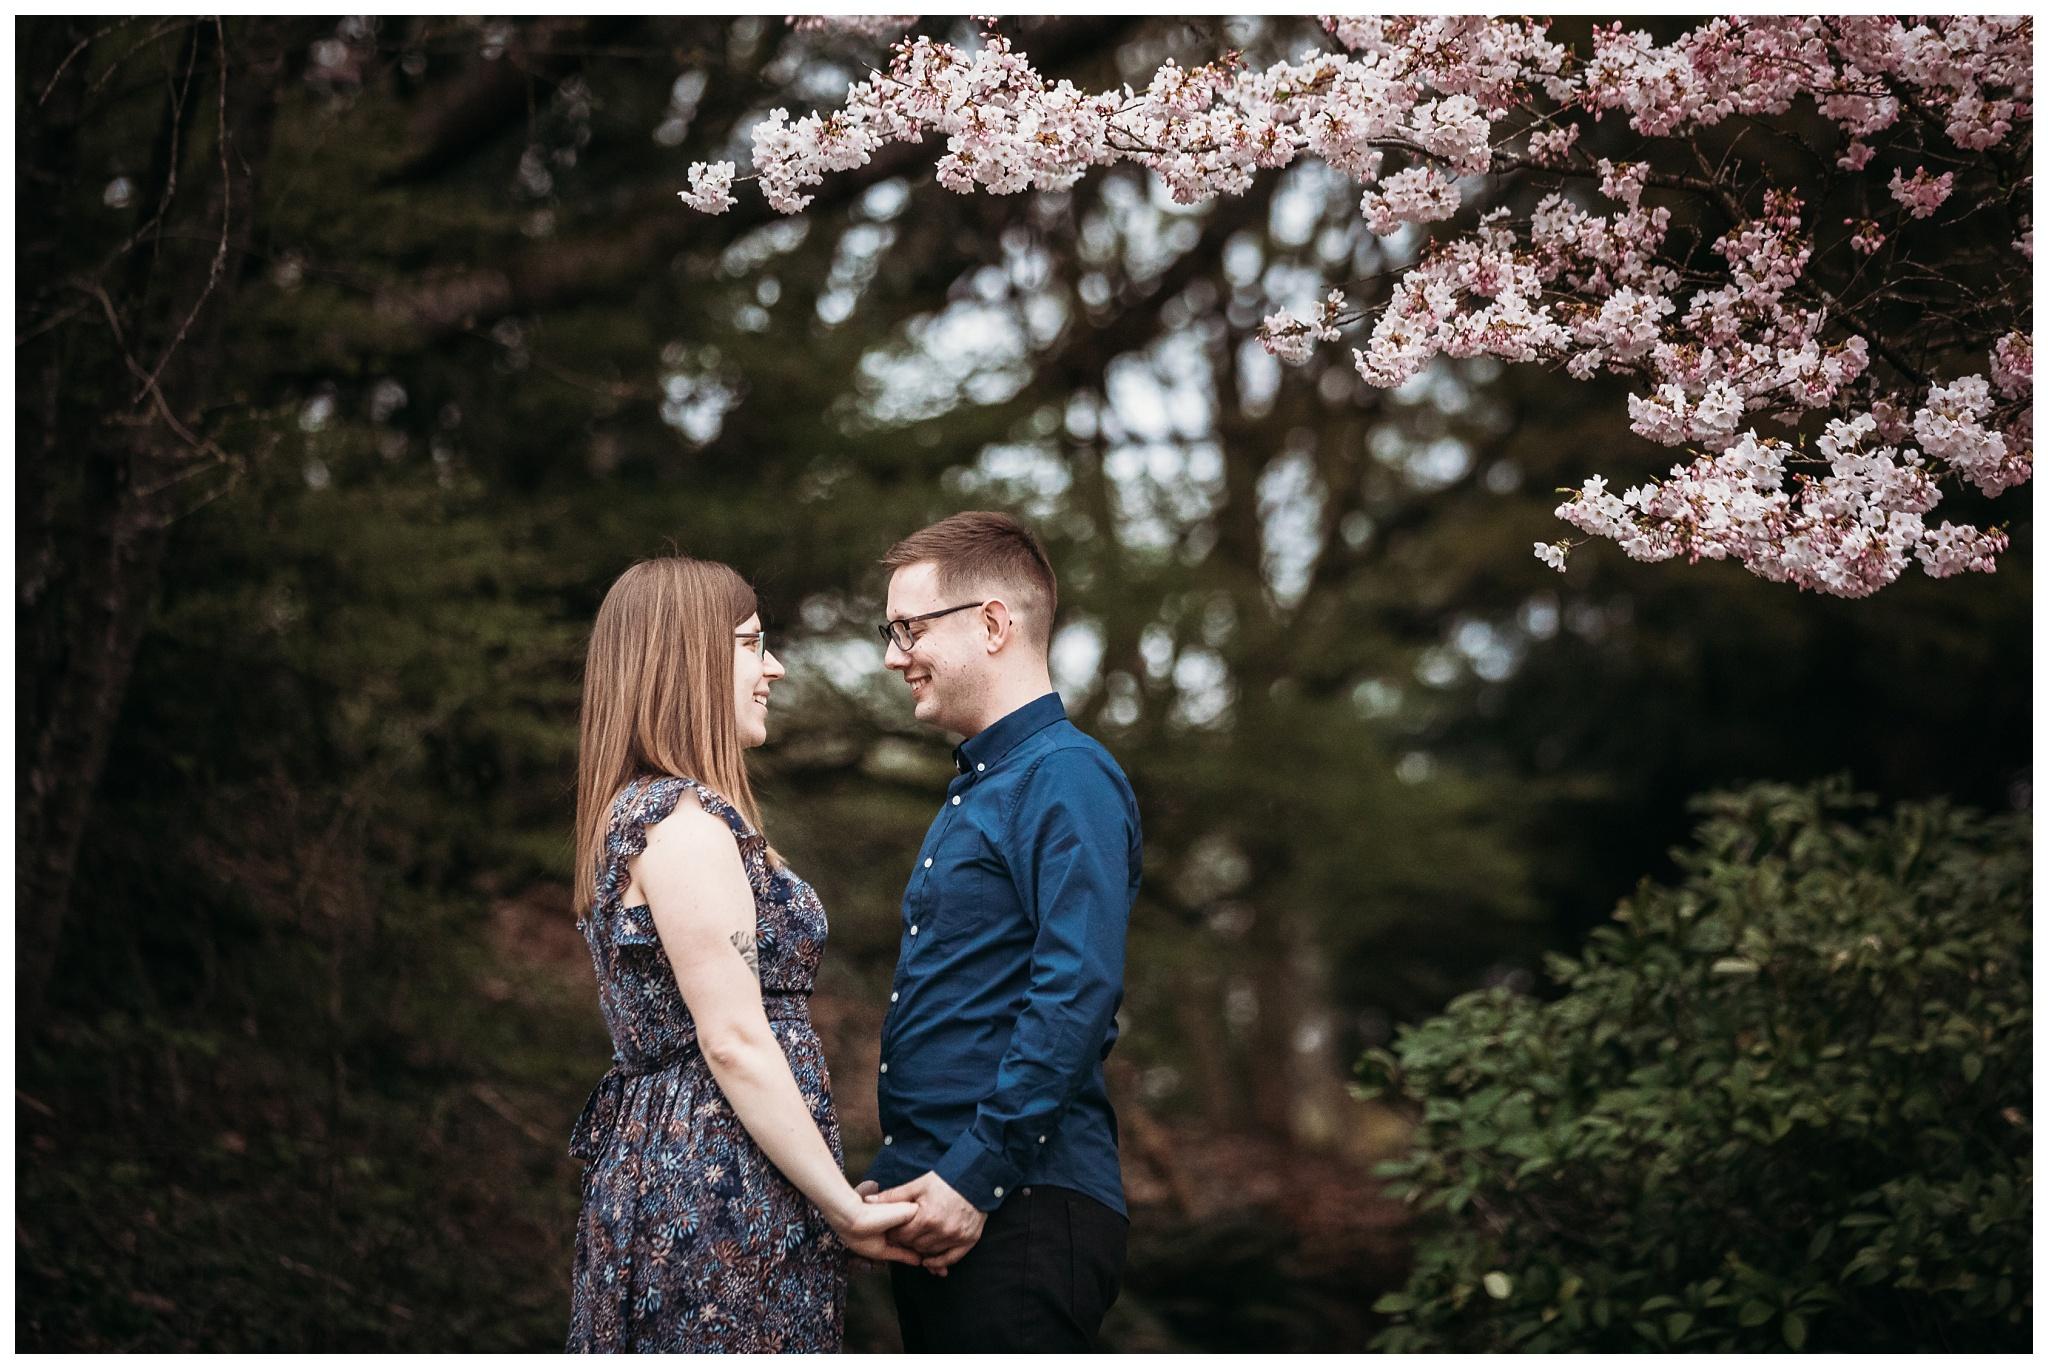 Queen Elizabeth Park Spring Engagement Photography Cherry Blossom Photos Couple Romantic_0011.jpg